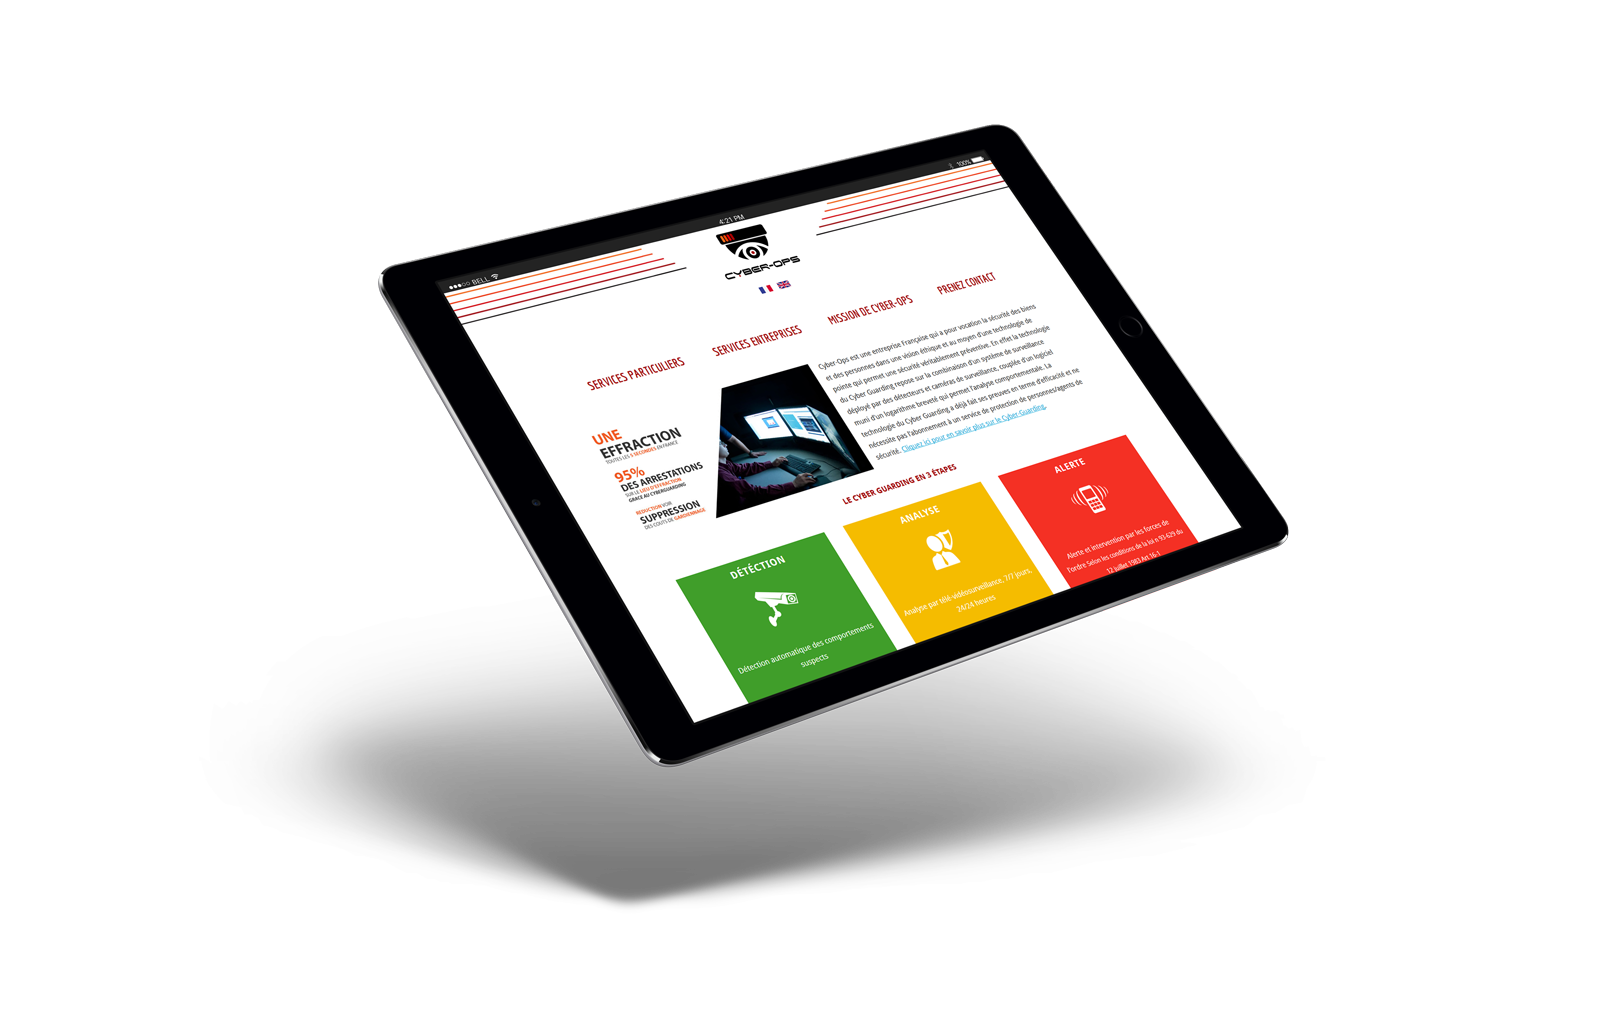 iPad Air 2 Mockup - Cyber-Ops